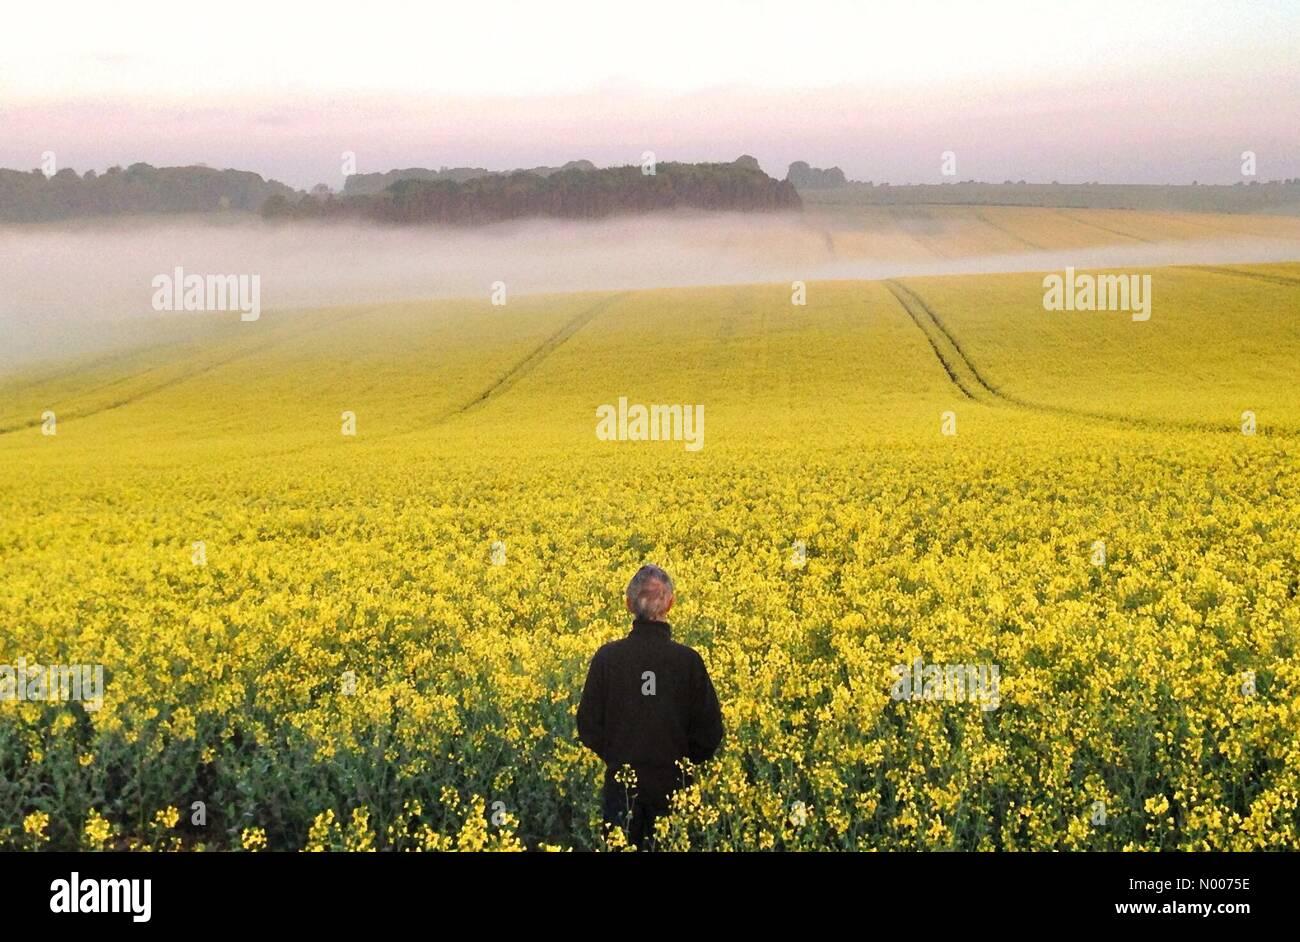 Wantage, UK. 17th May, 2016. UK Weather: Misty Rapeseed at dawn, Wantage, Oxon Credit:  nidpor/StockimoNews/Alamy - Stock Image